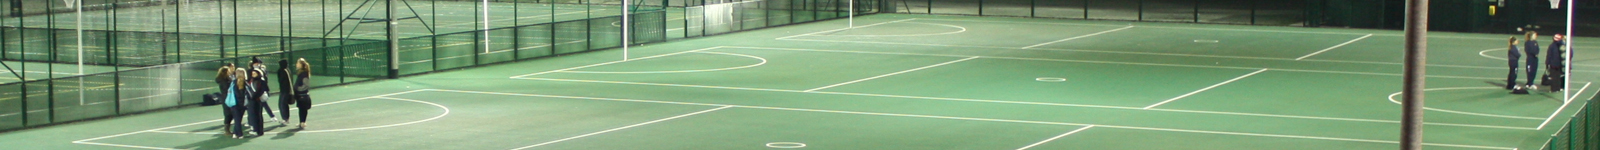 outdoor netball